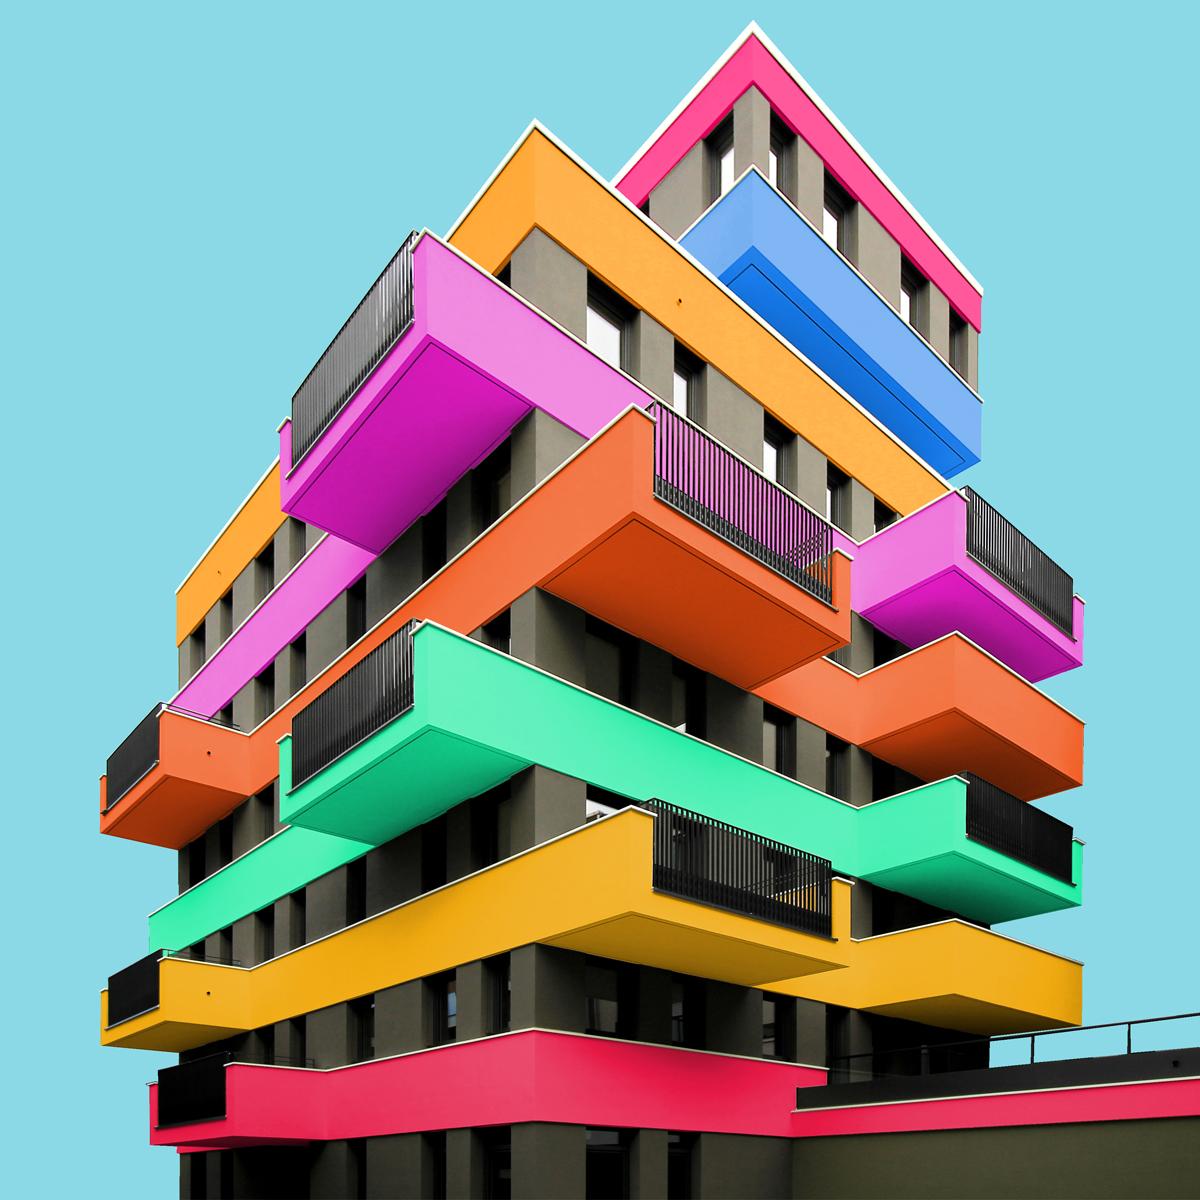 paul-eis-farbe-architektur3